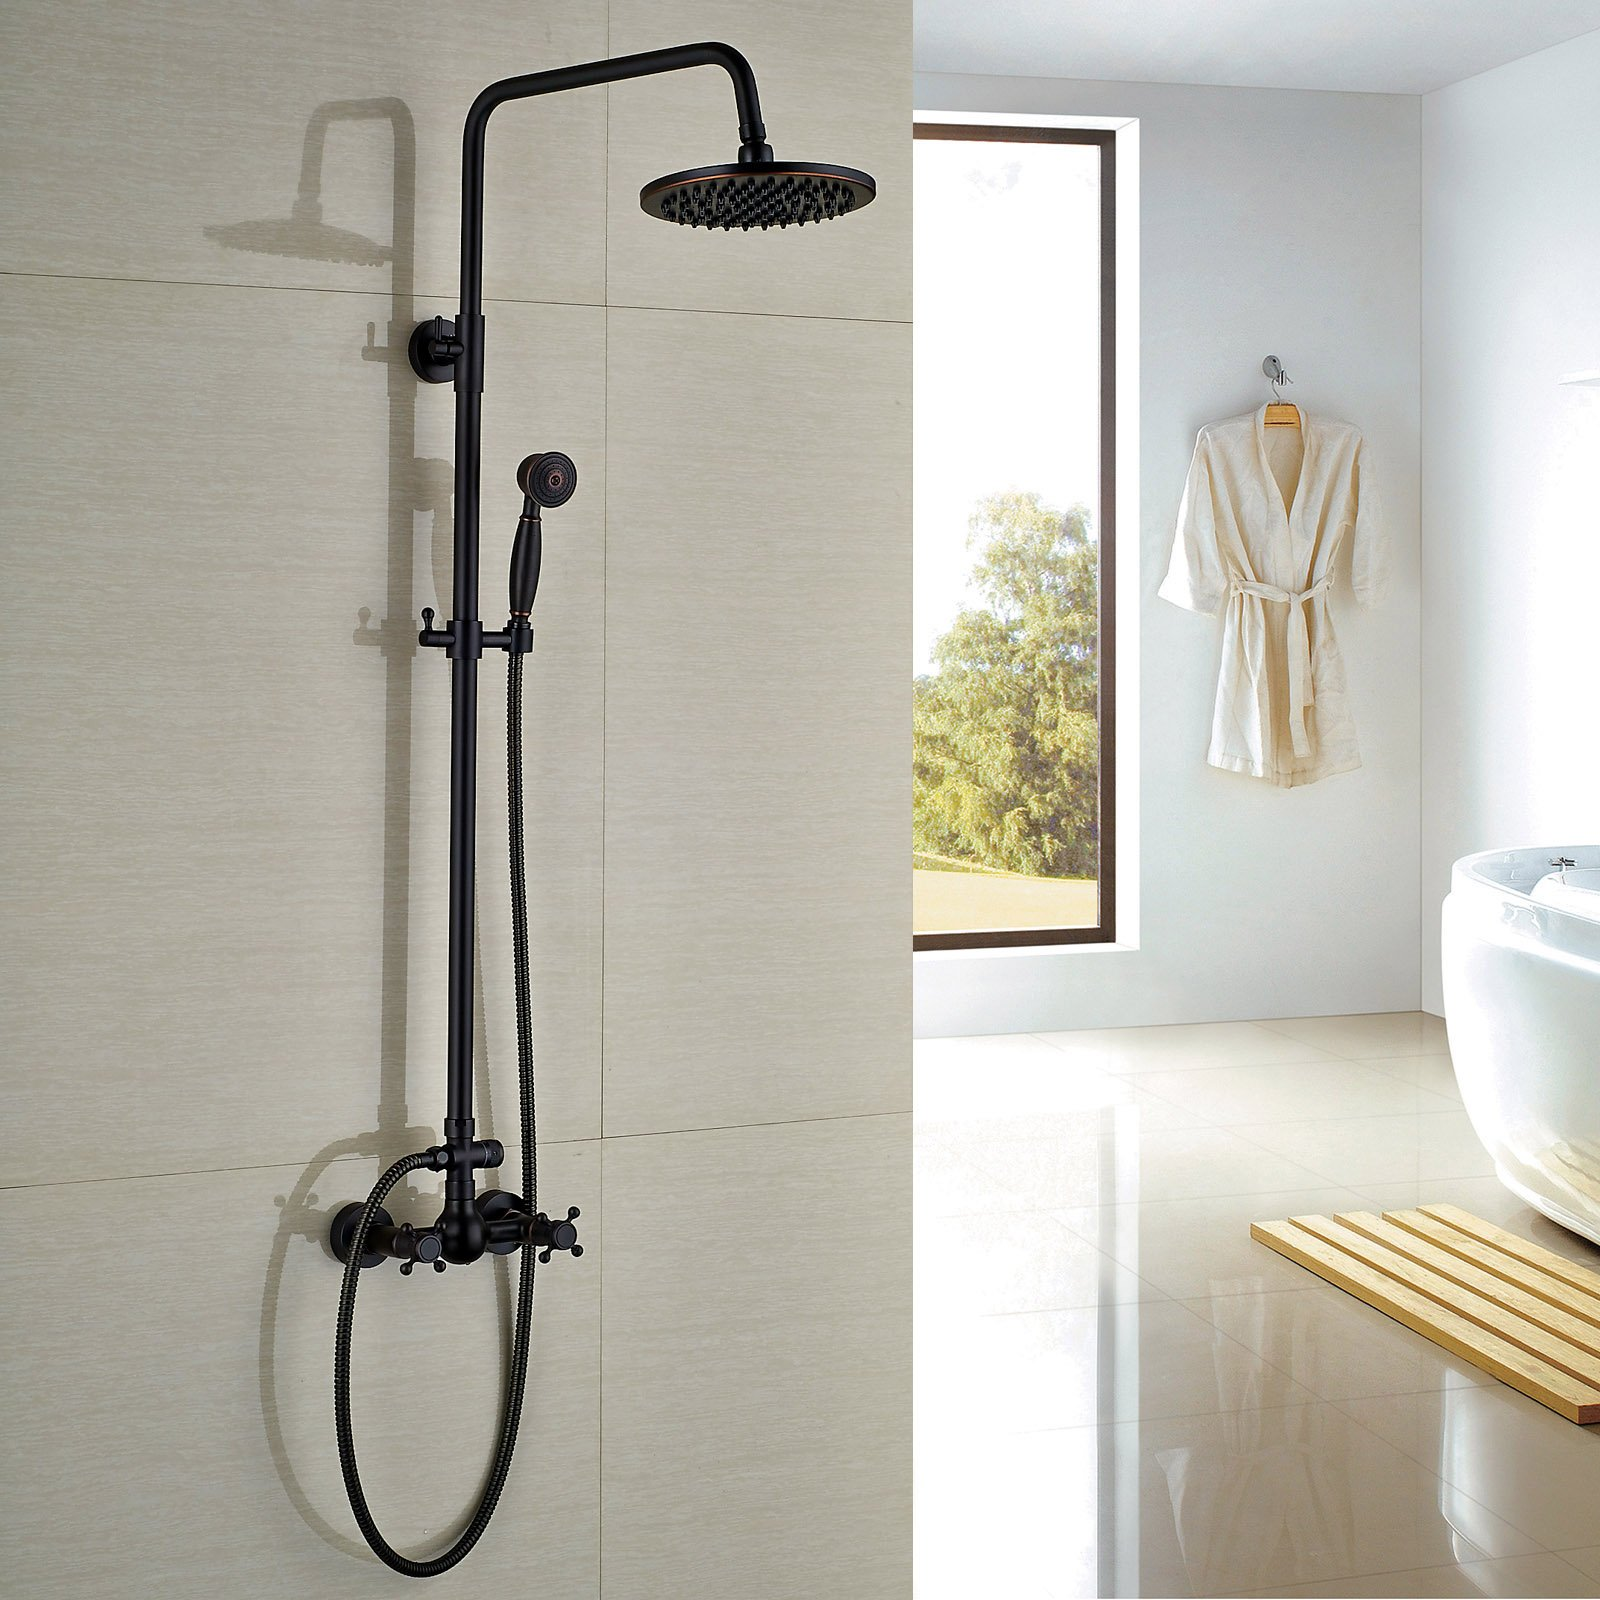 Rozin Bathroom Shower Faucet Set 8'' Rain Shower Head + Hand Spray Oil Rubbed Bronze by Rozin